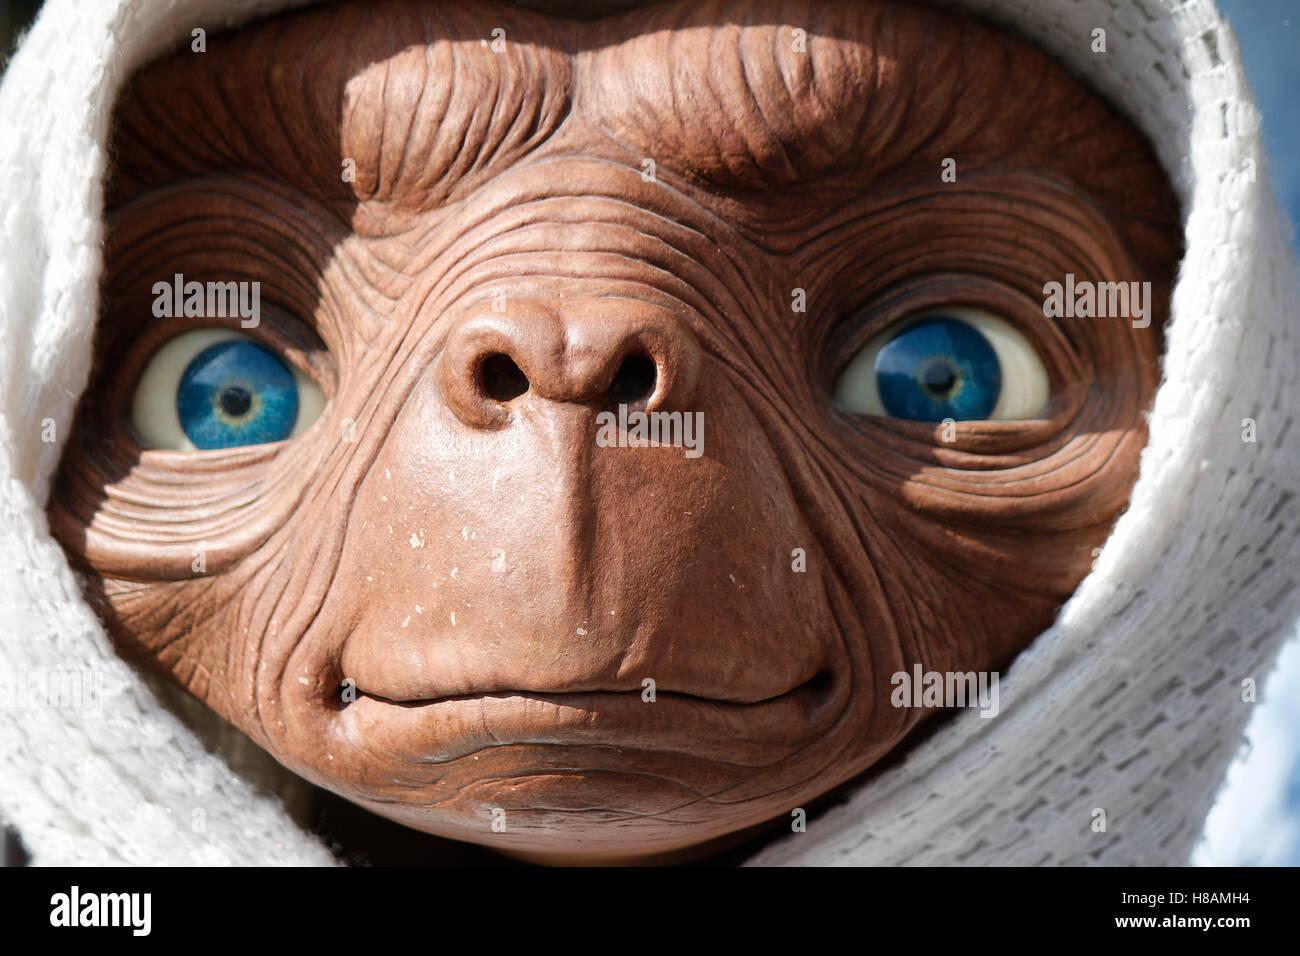 Wachsfigur: ET, Berlin. Stock Photo